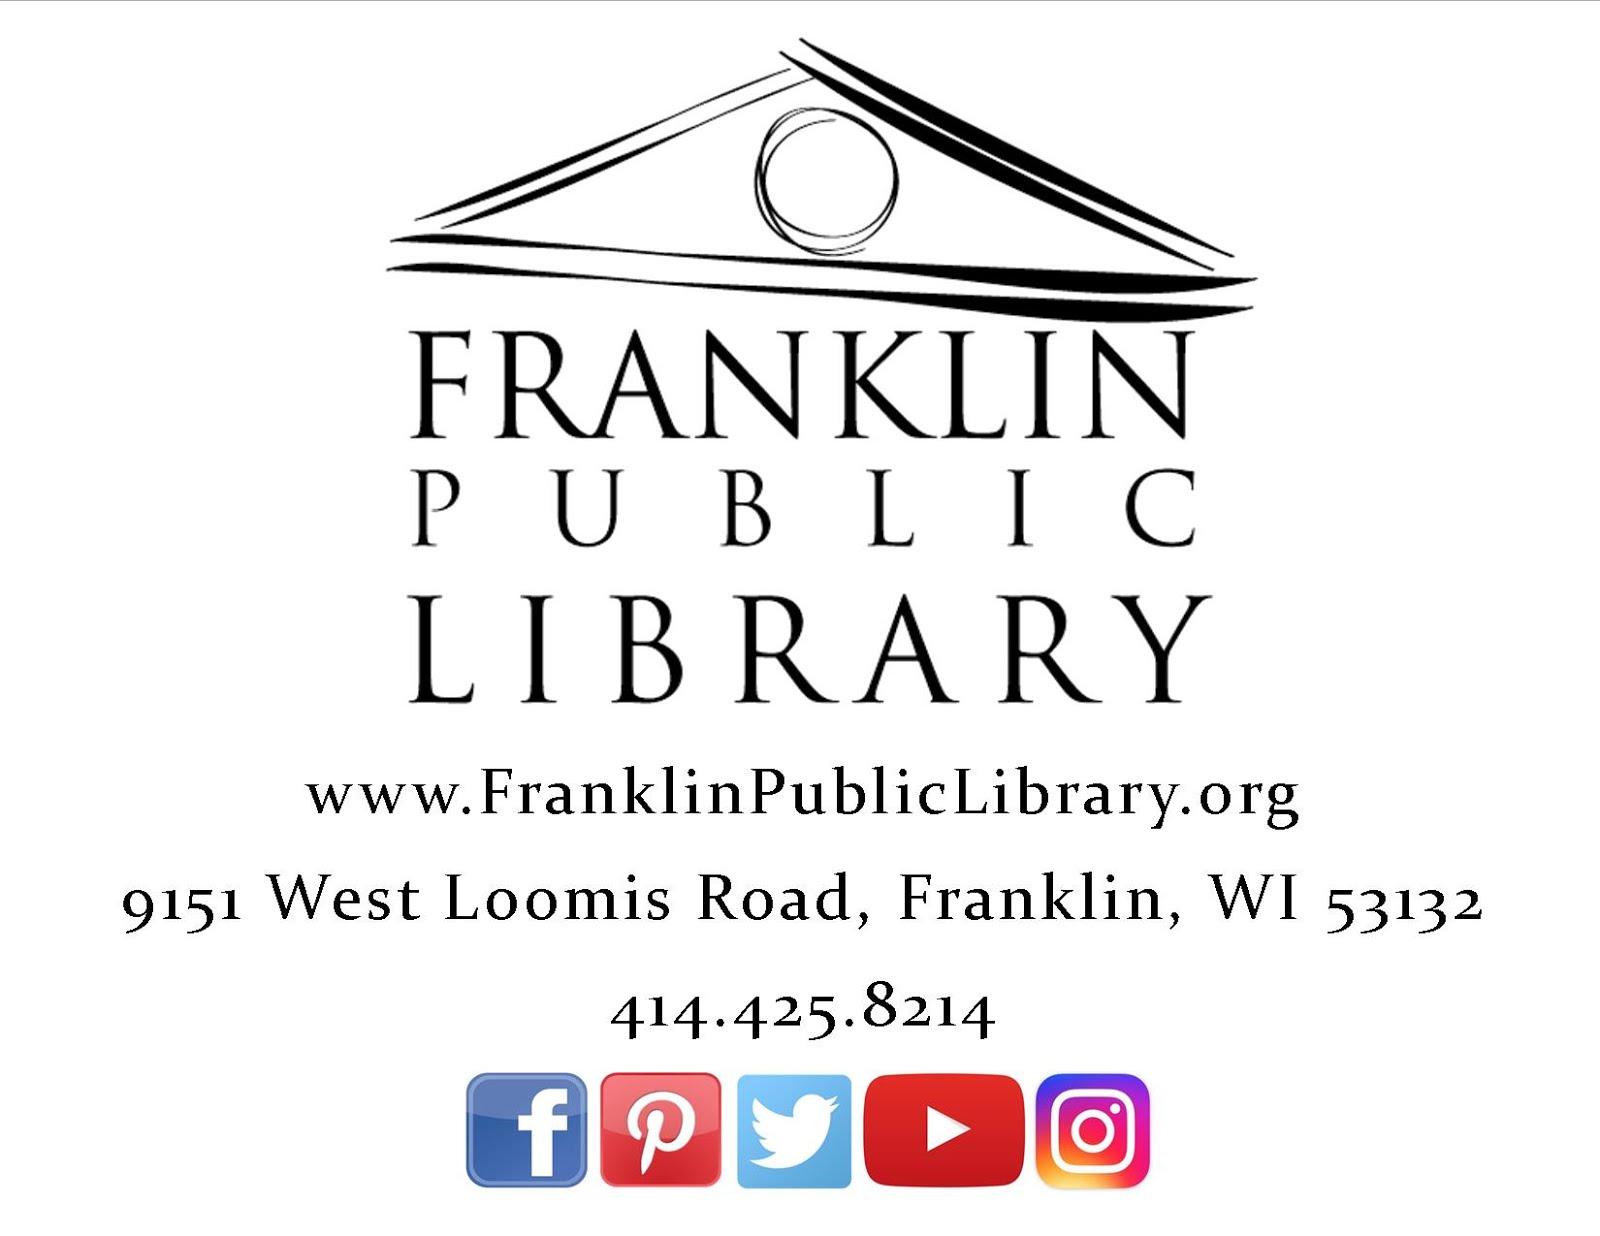 Franklin Public Library